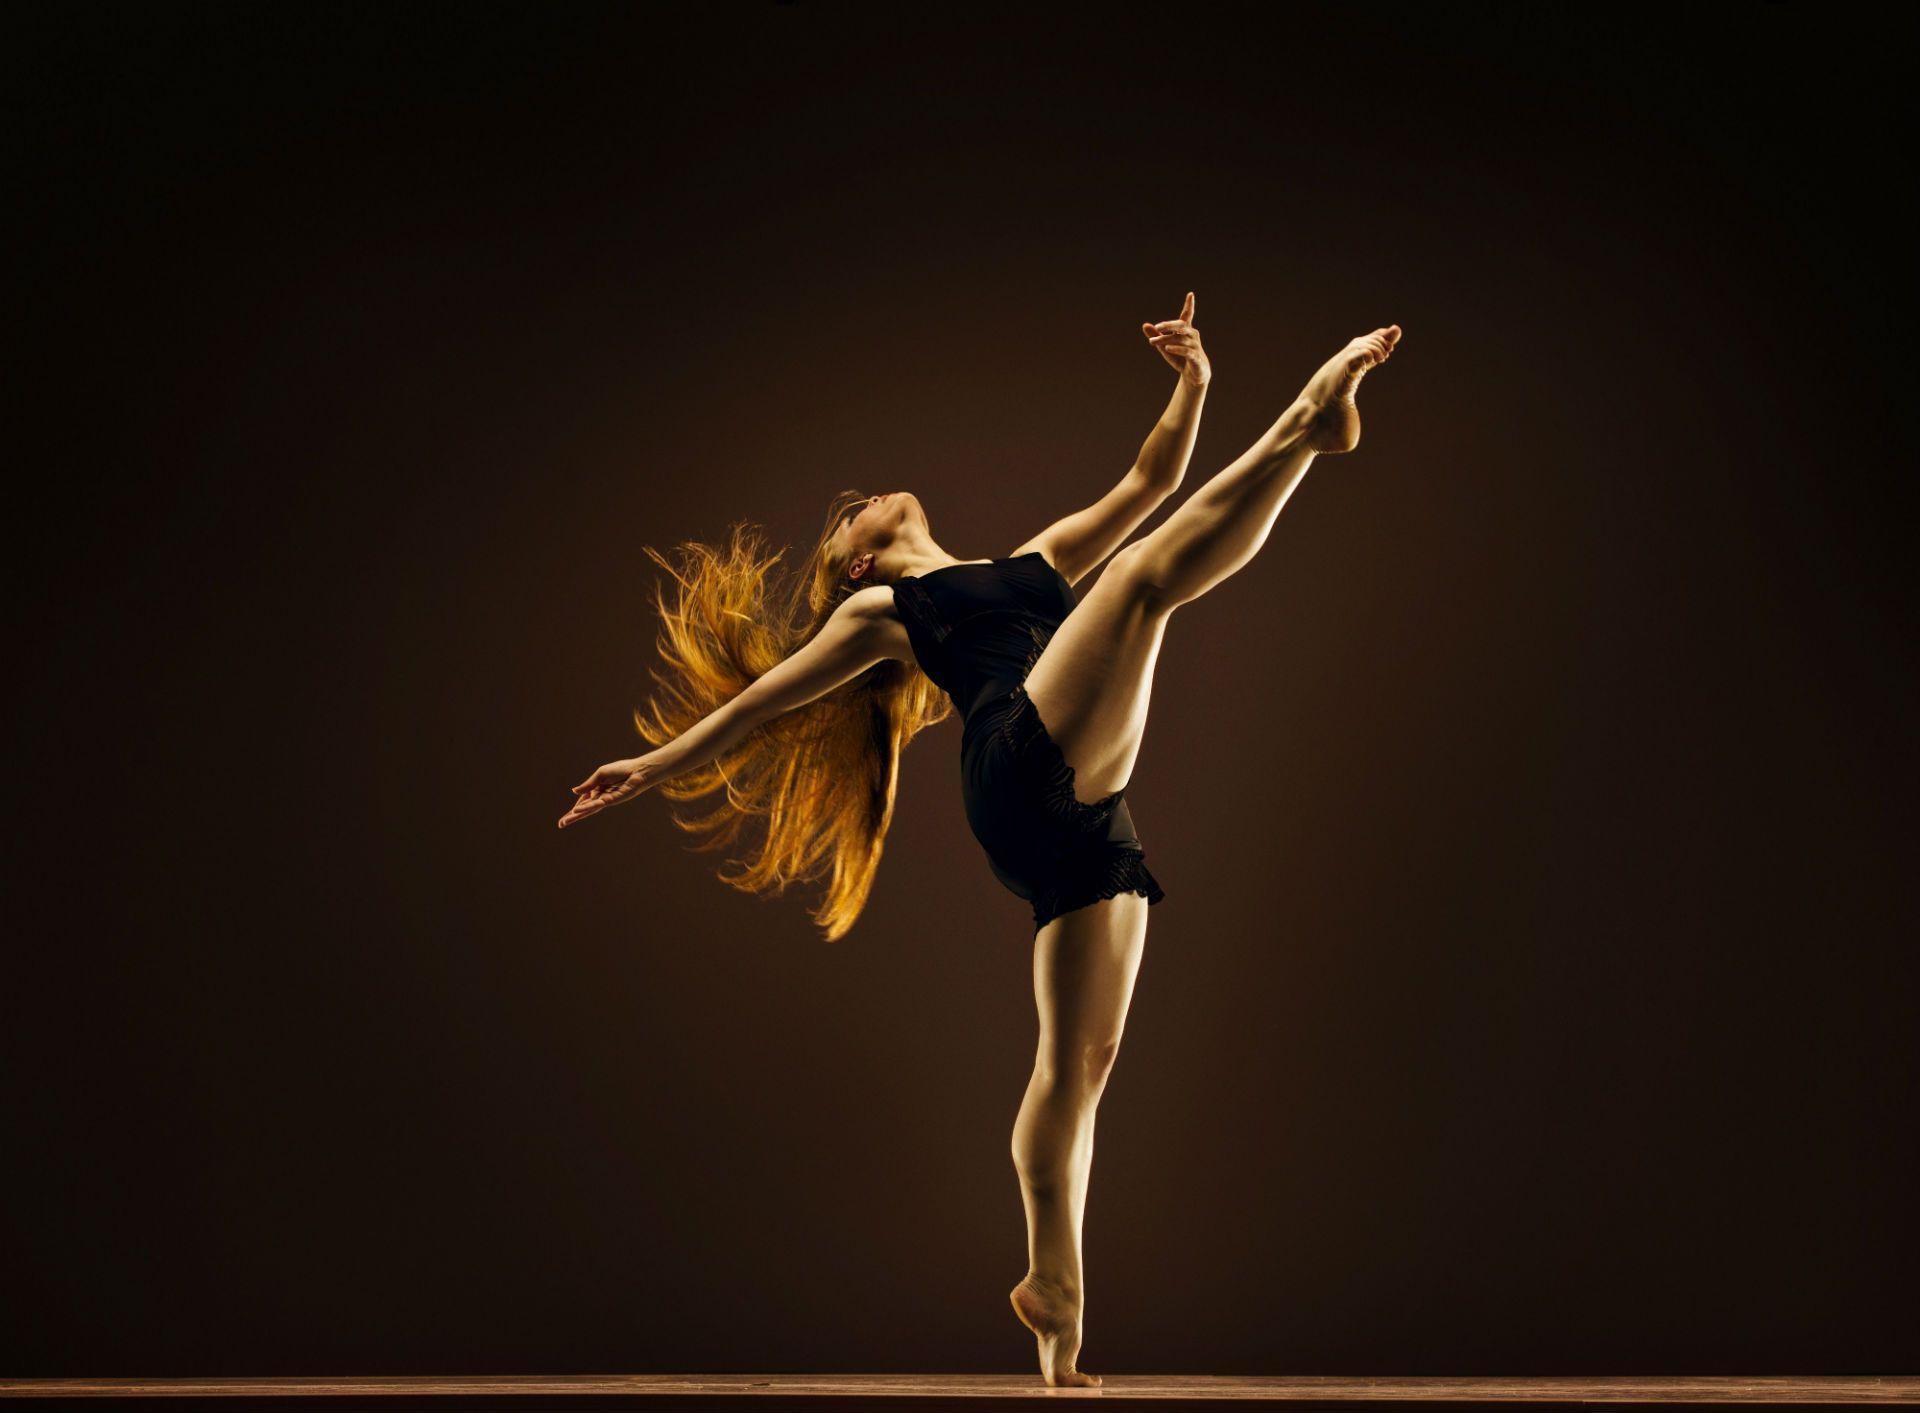 Dancer Desktop Wallpapers Top Free Dancer Desktop Backgrounds Wallpaperaccess